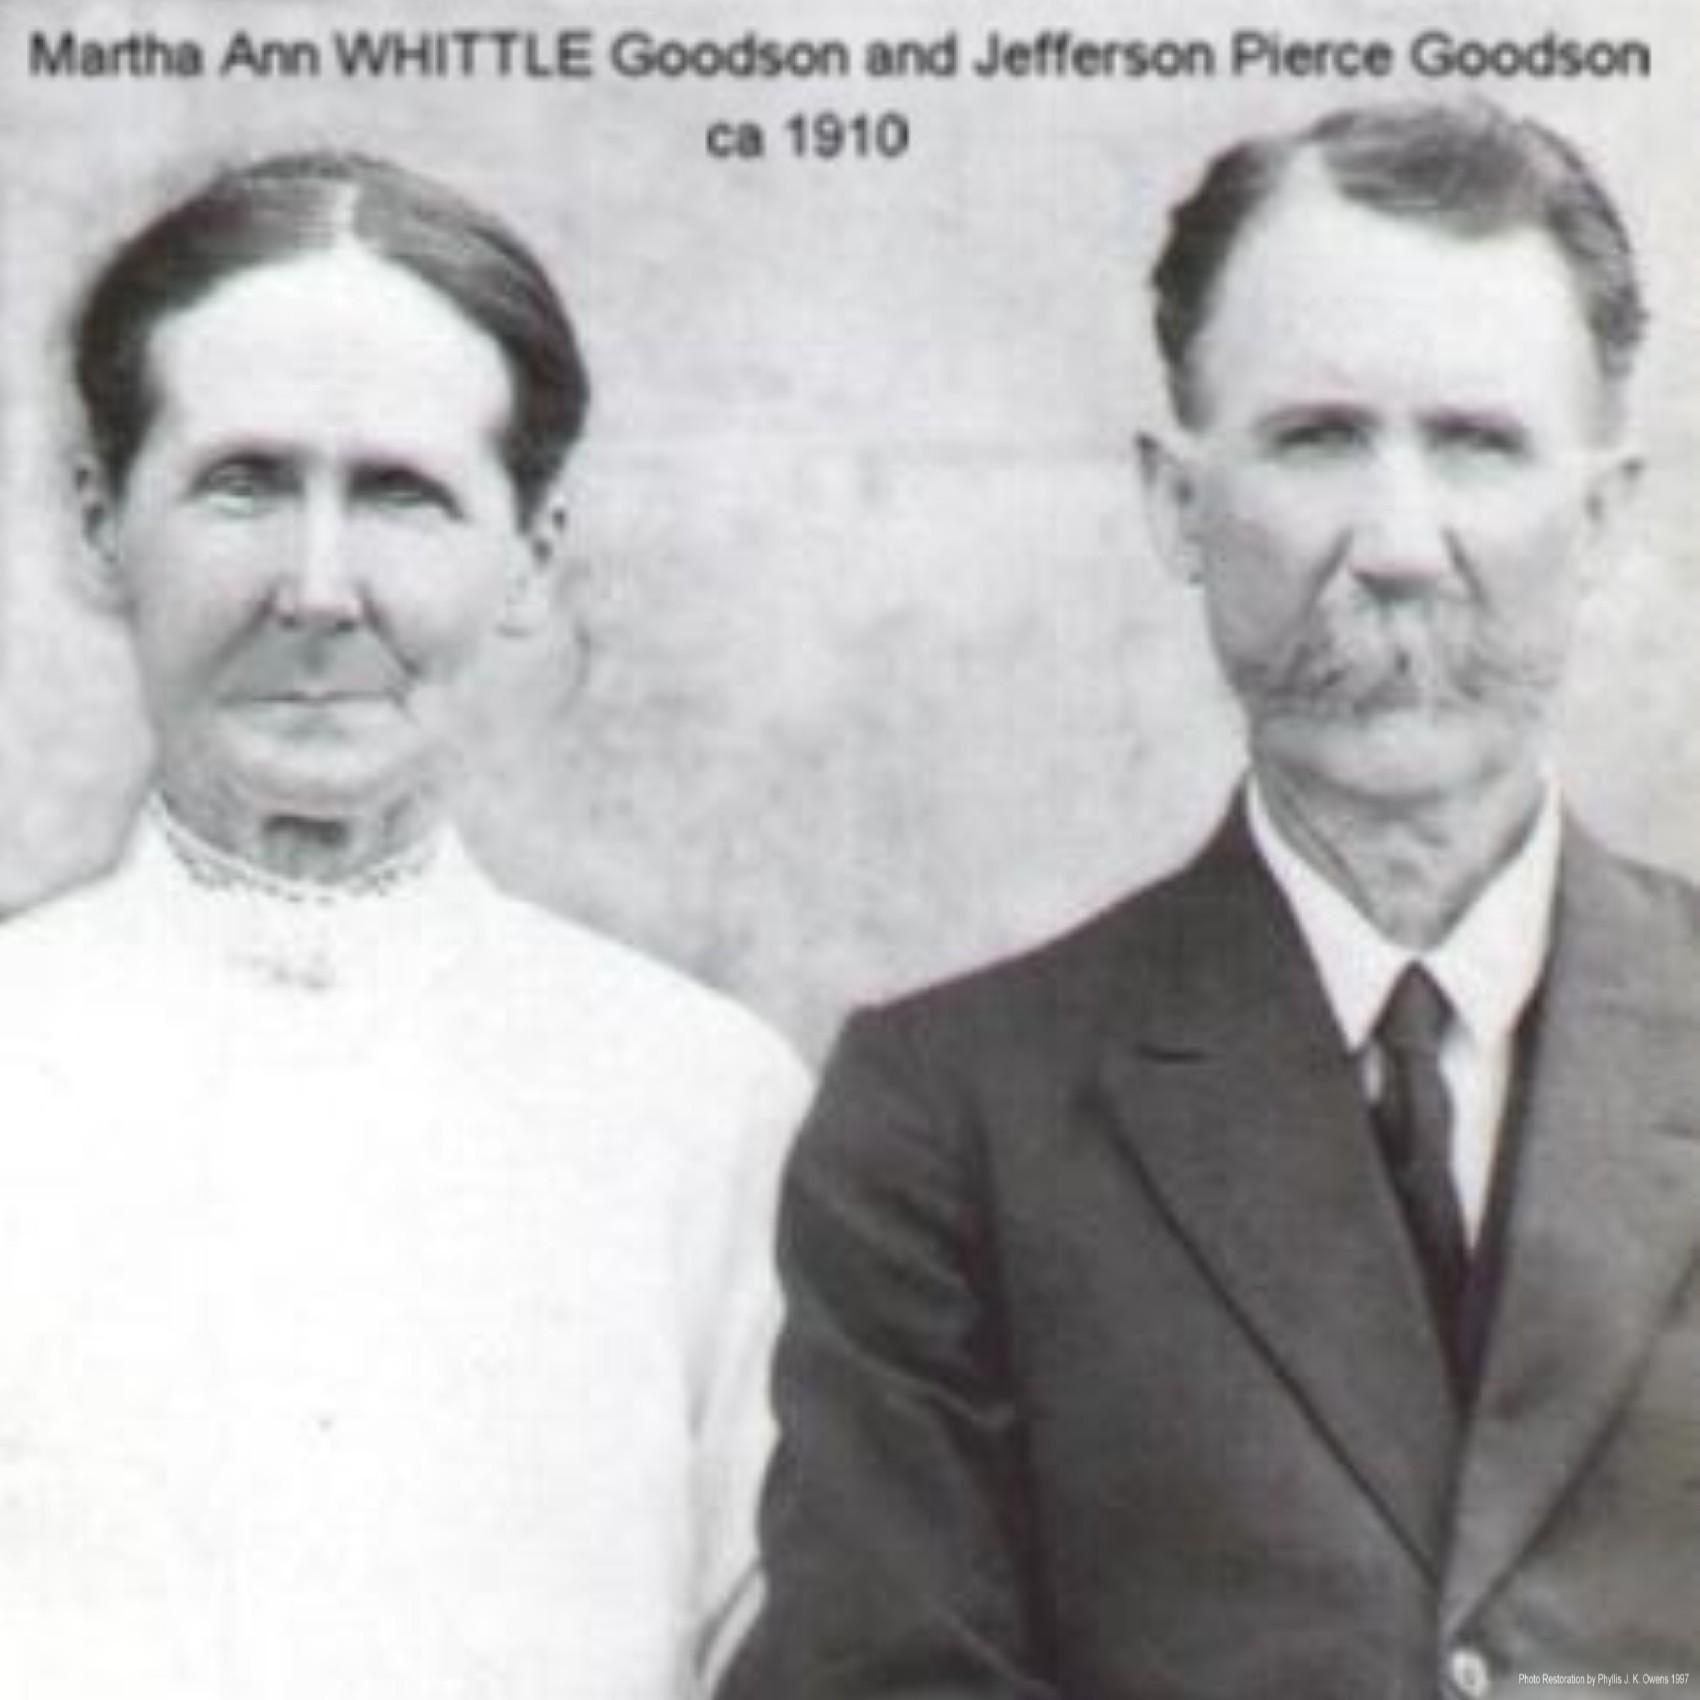 Grampas and Gramma, My Great-Great Grandparents, Martha WHITTLE Goodson and Jefferson Pierce Goodson (ca1910).....